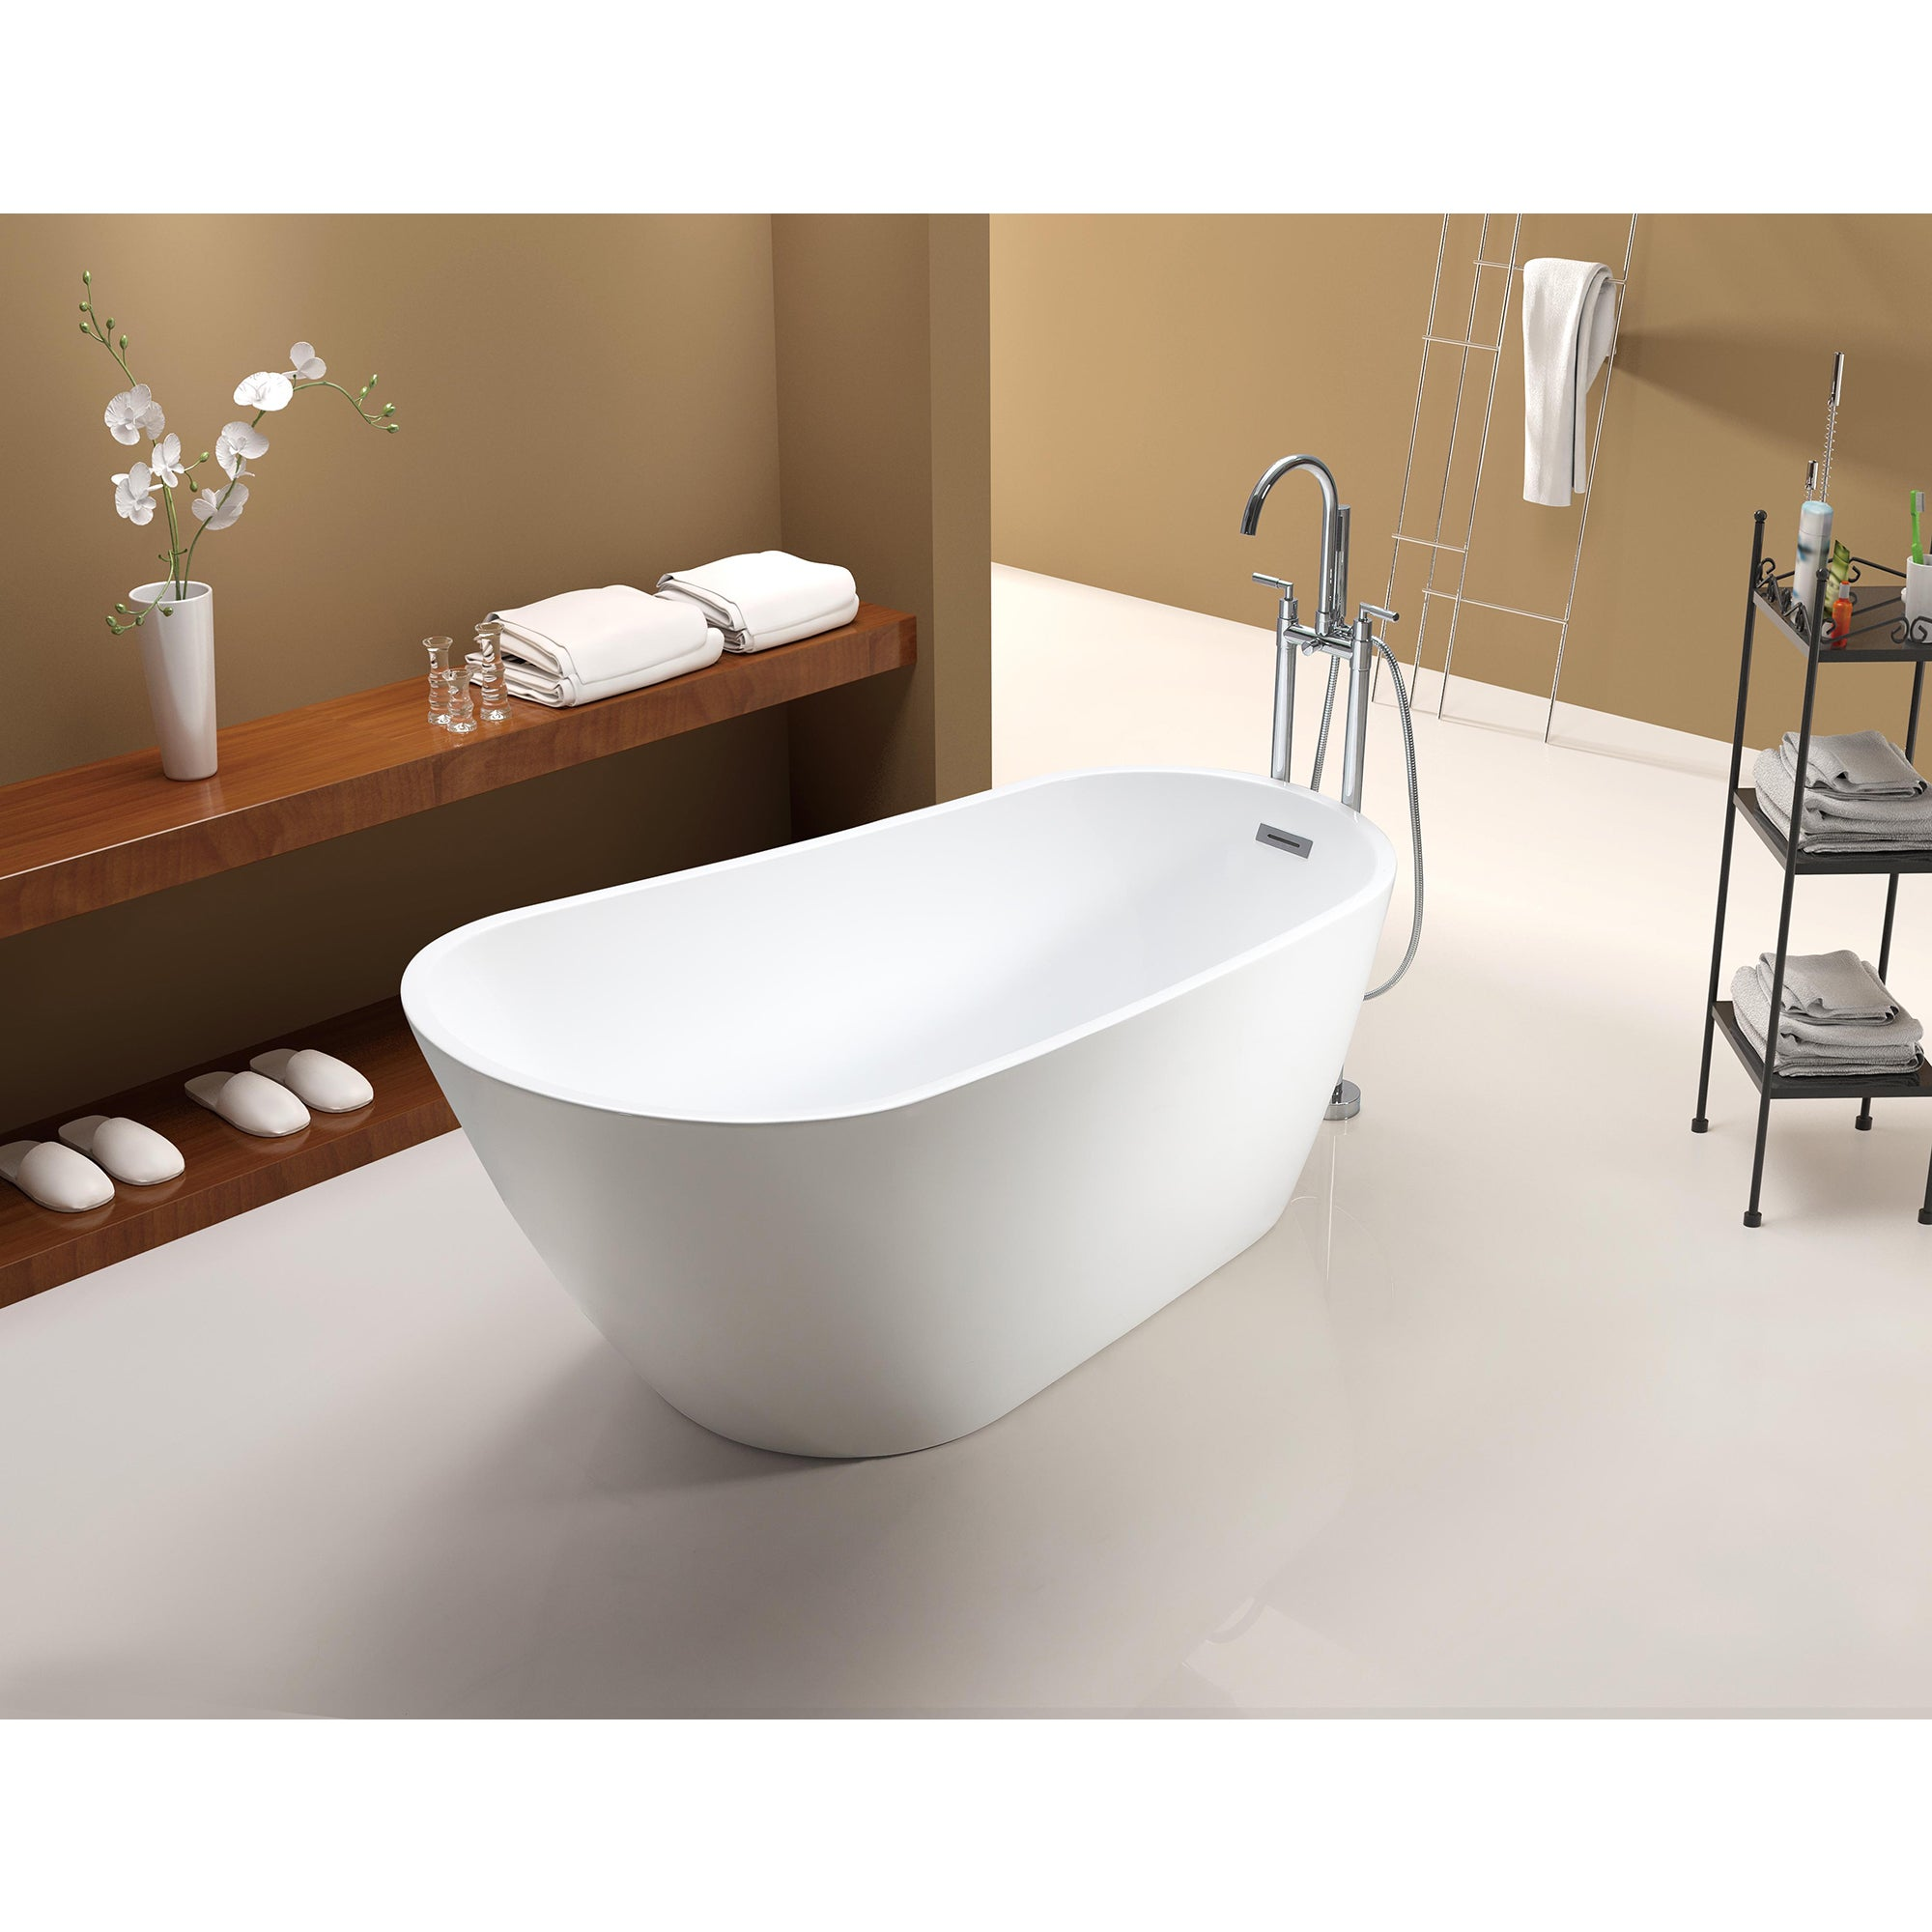 atrium suite hannover bathroom hotel near quiet rooms fair bathtub bathtubs wyndham hotels en